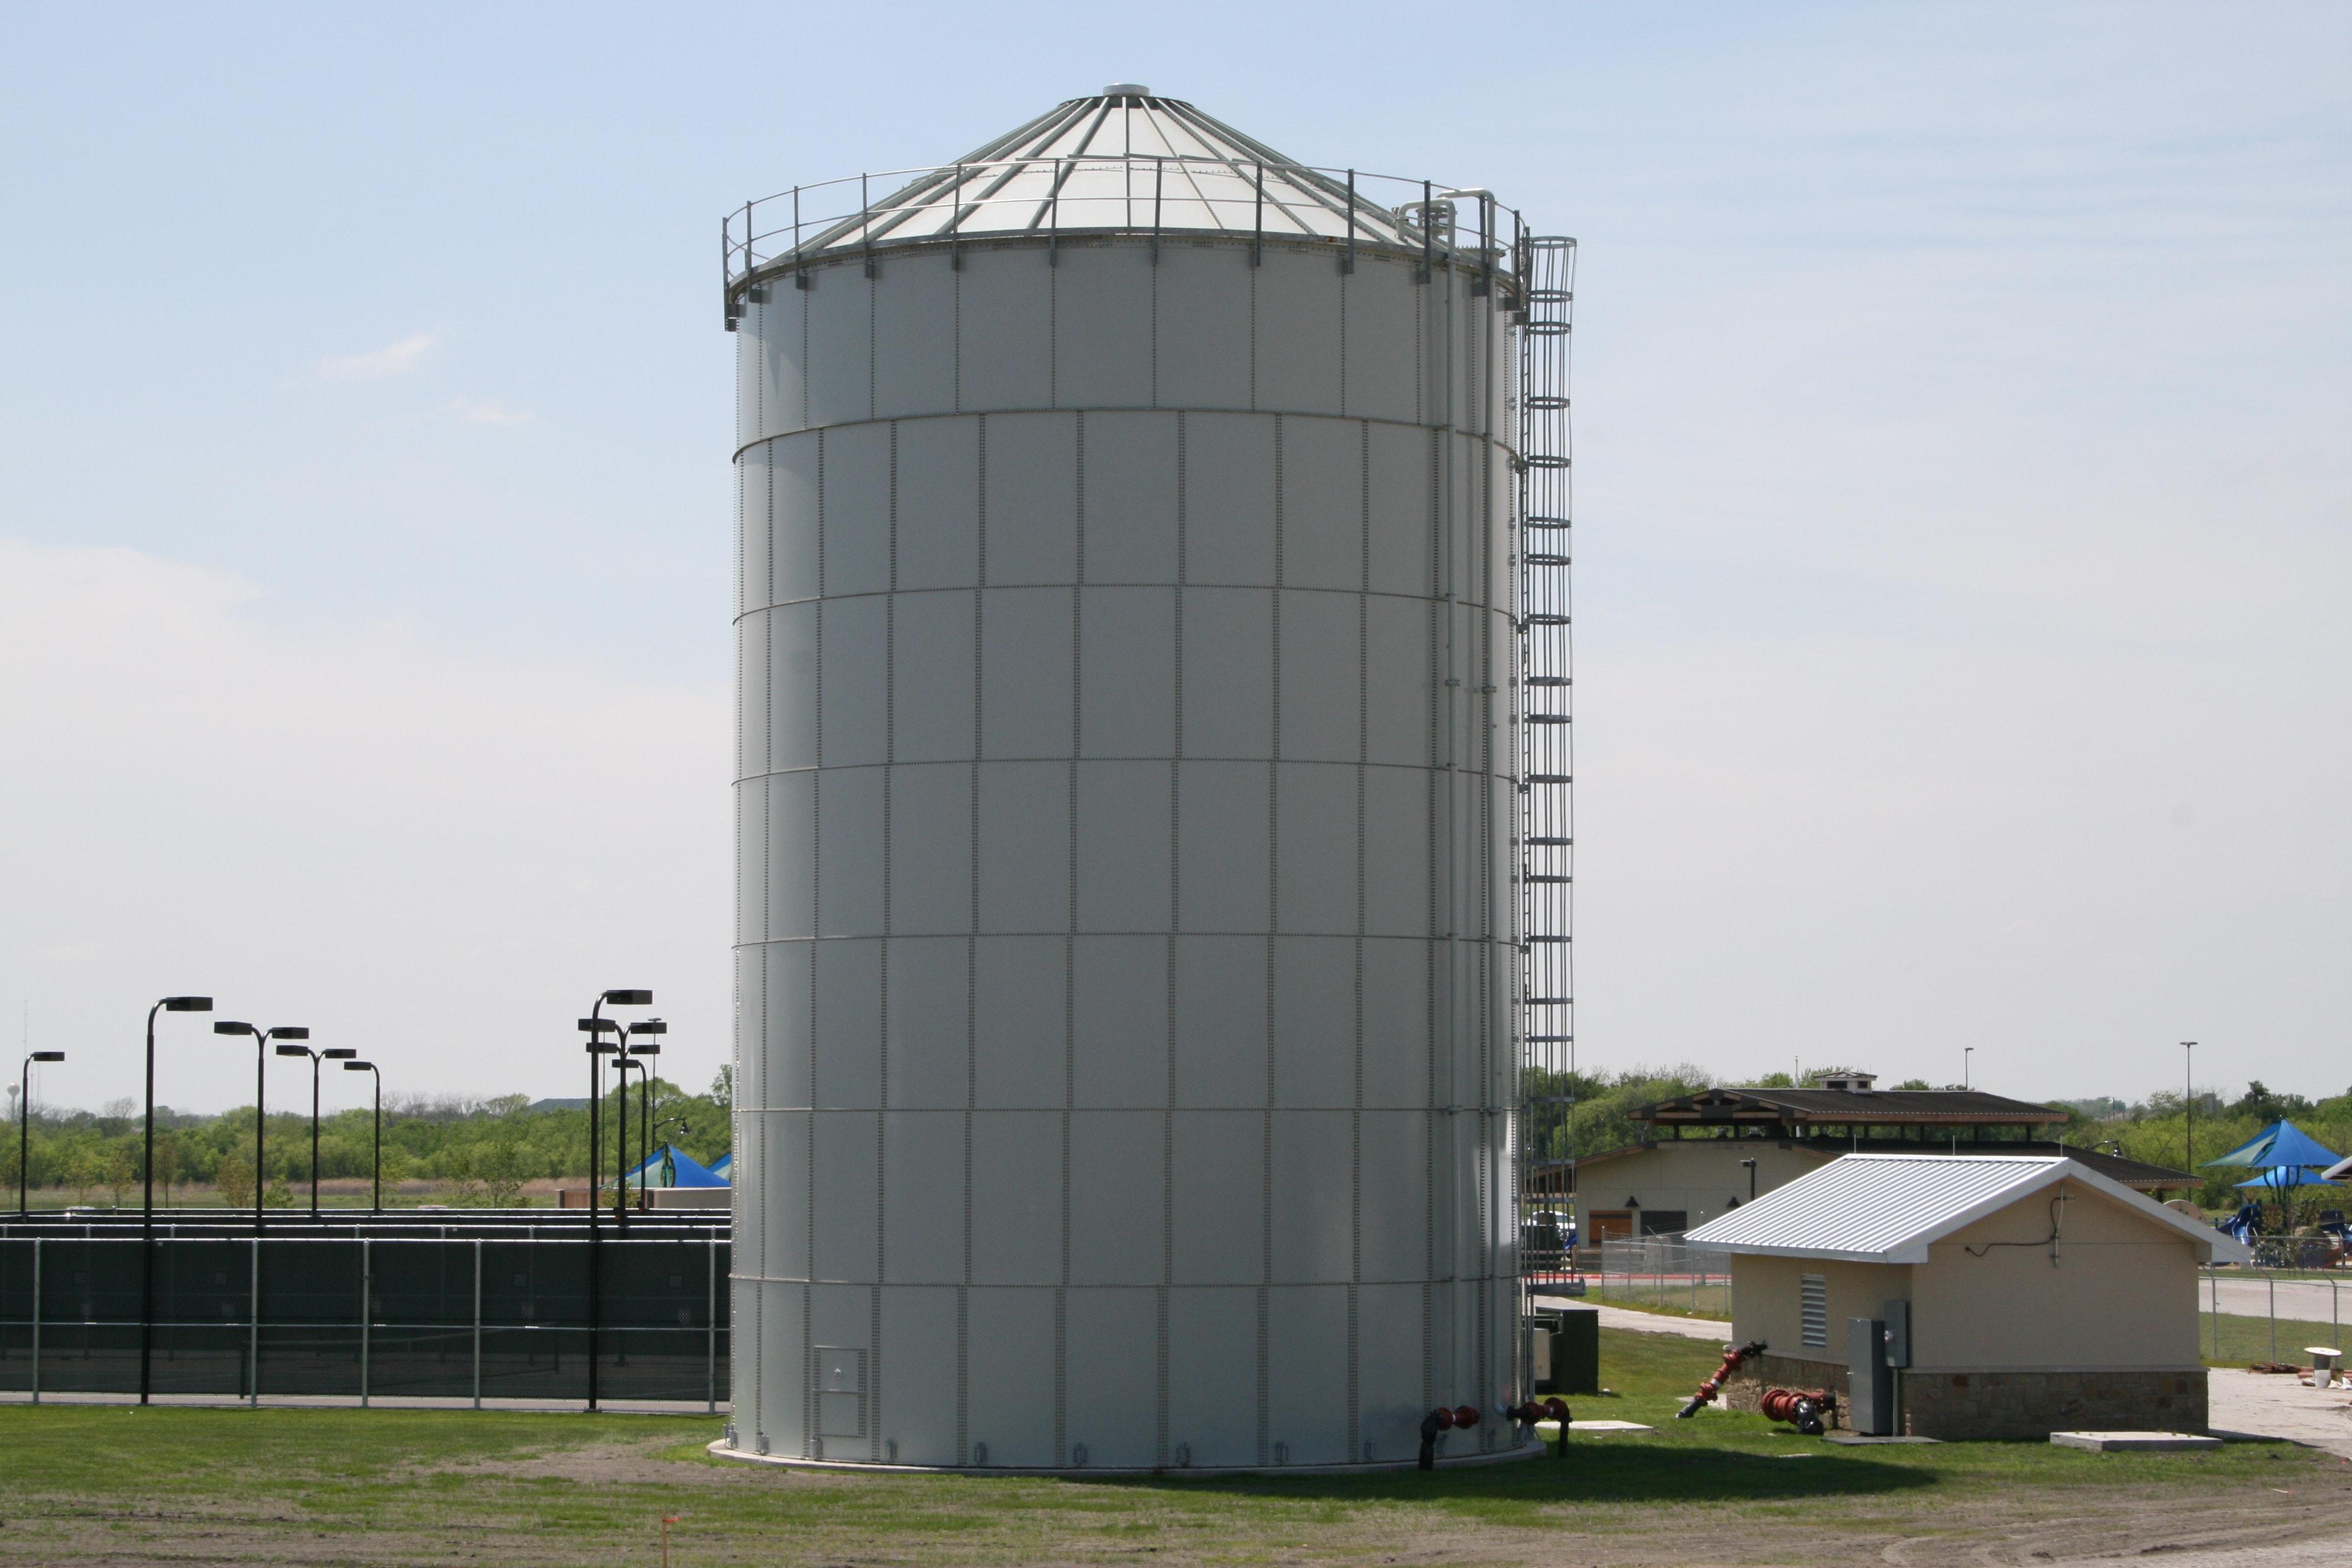 TecTank Epoxy Coated Liquid Storage Tanks Manufacturer